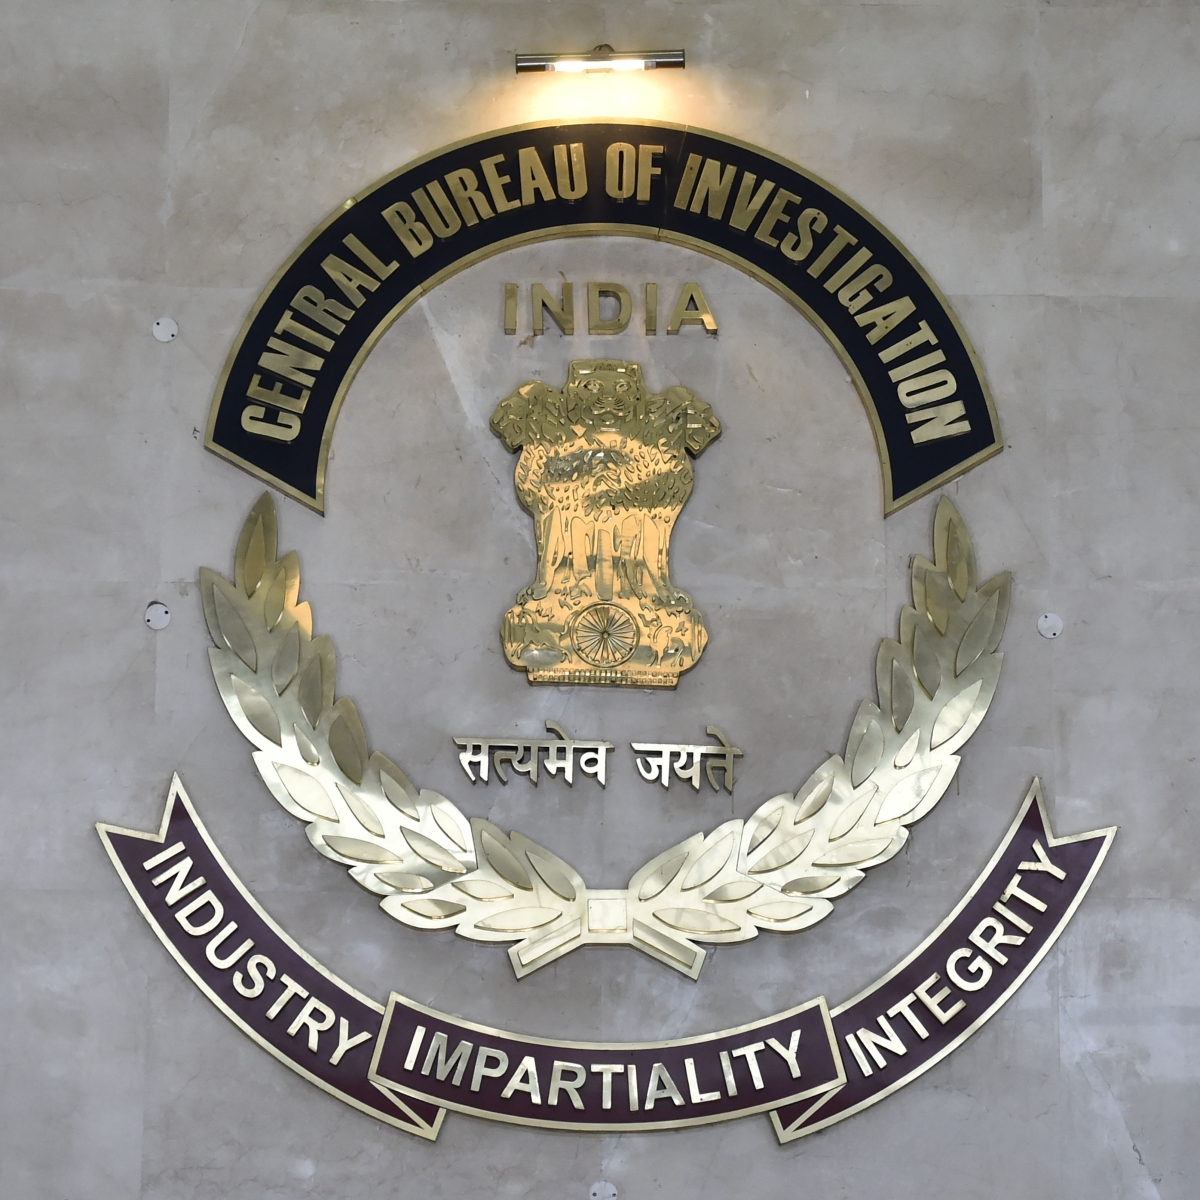 Agri minister demands CBI probe against Nath, Sonia, RaGa